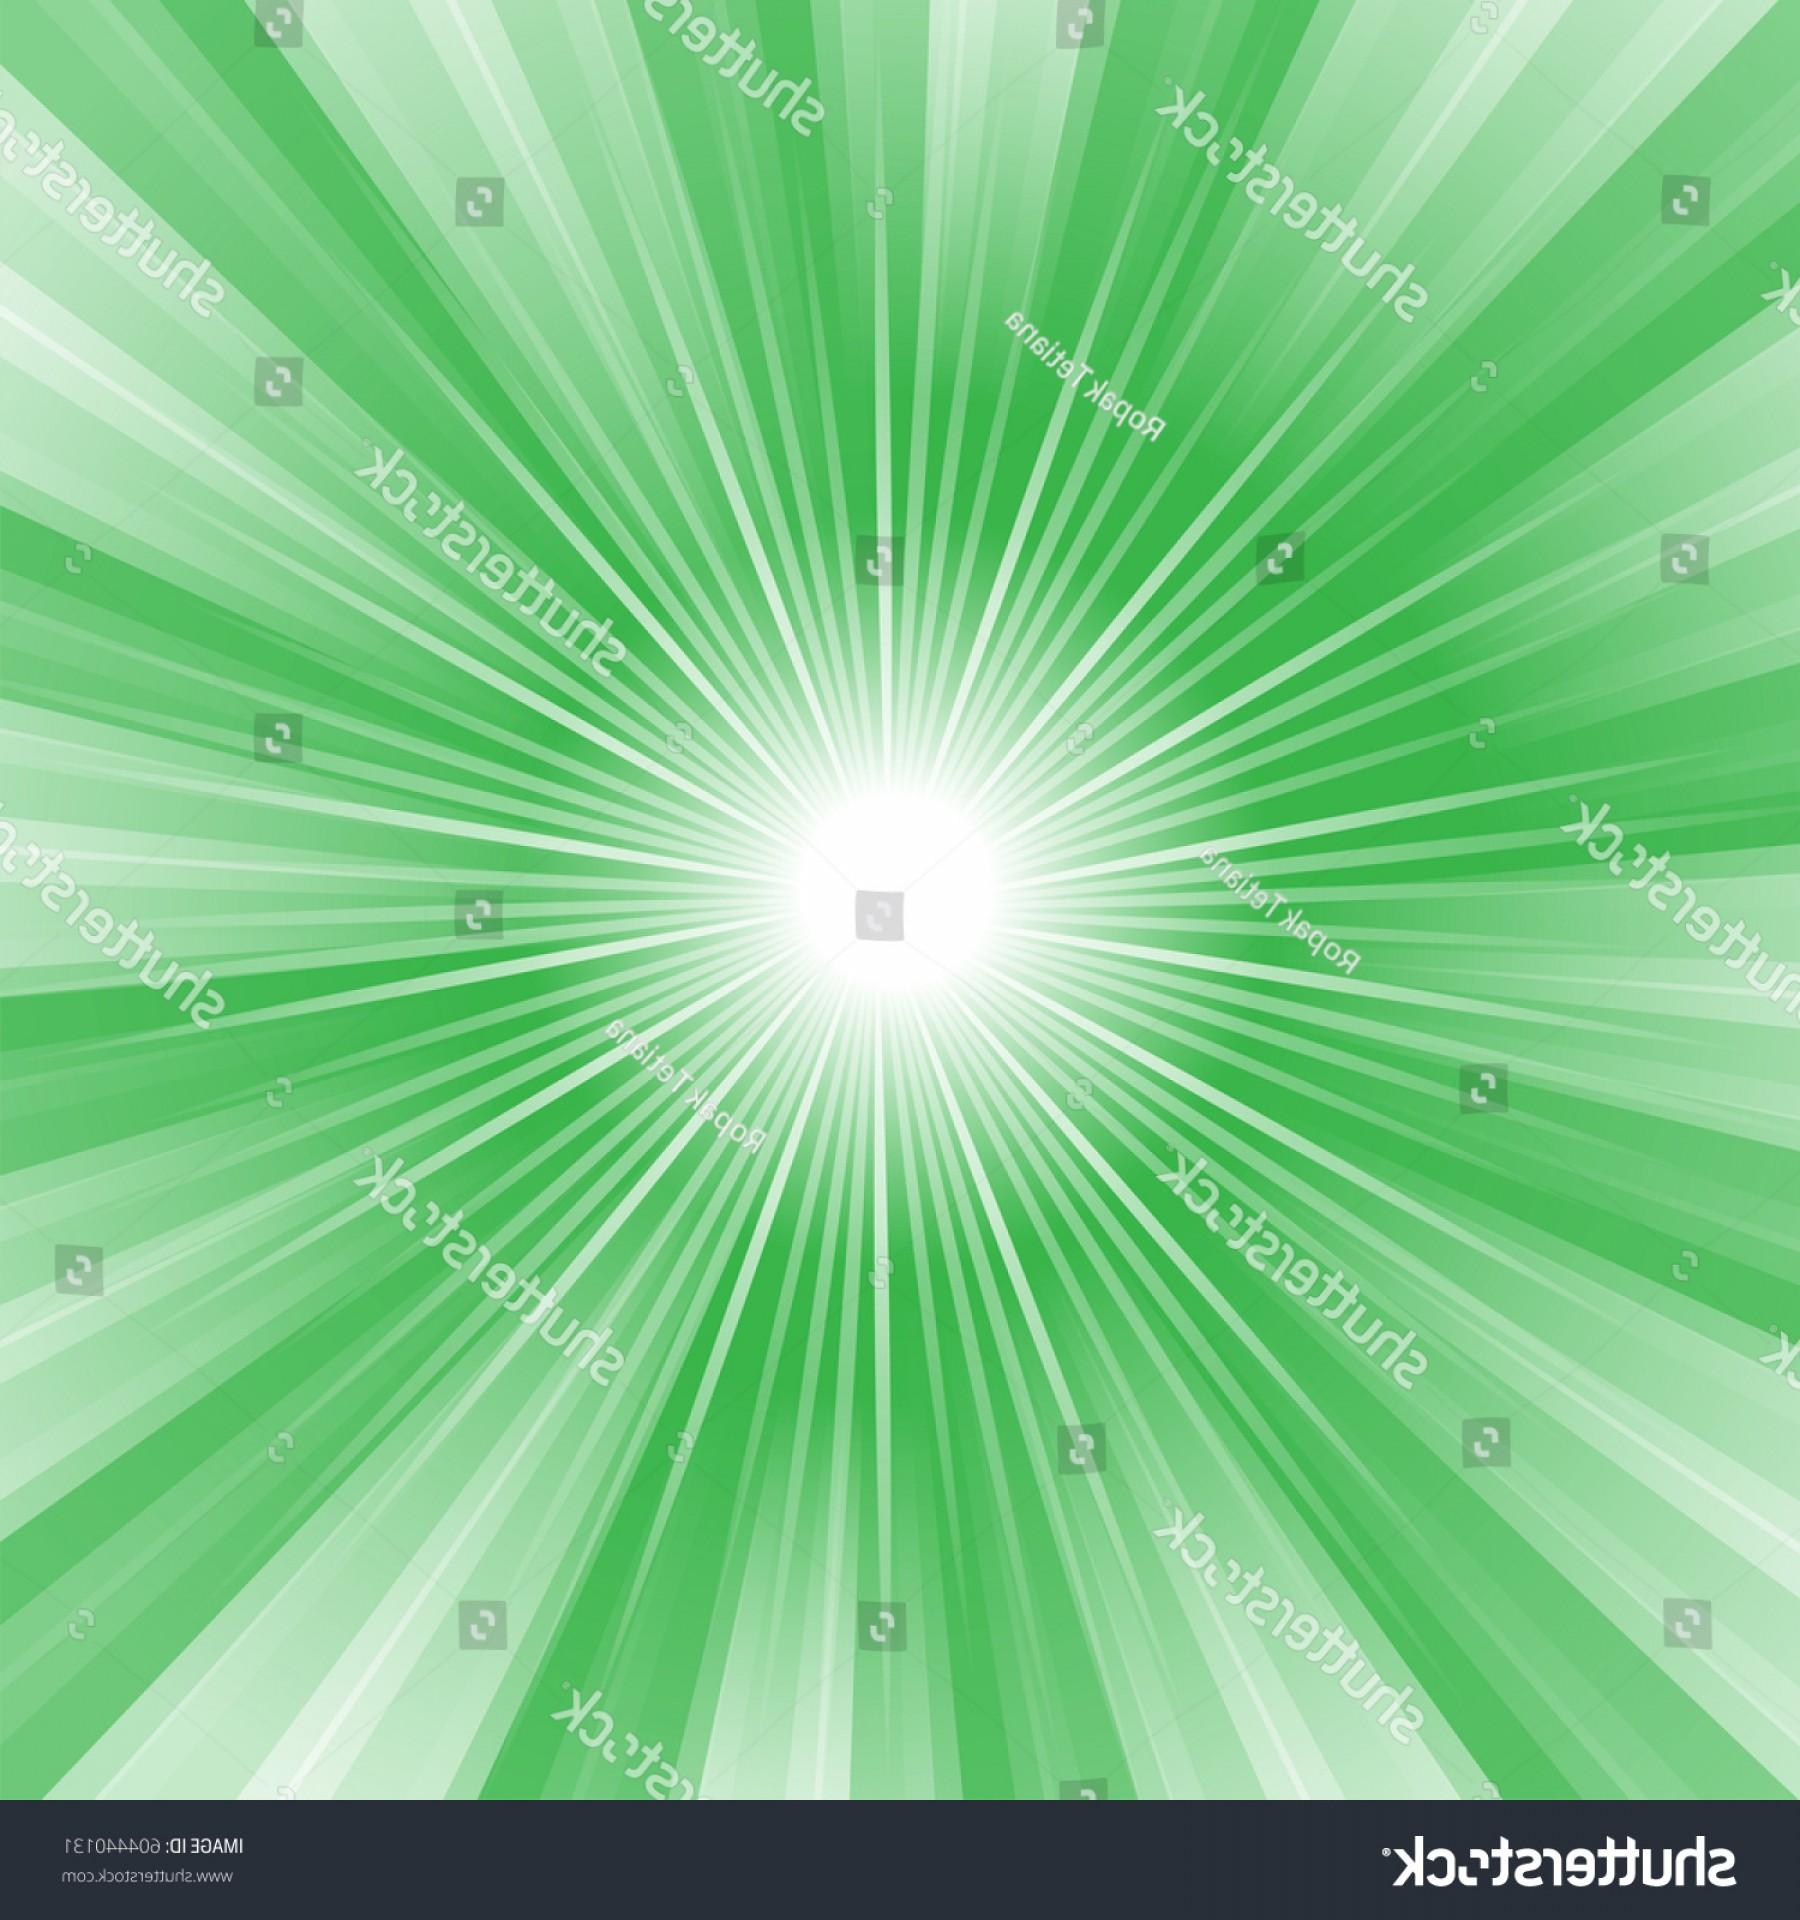 Green light ray jpeg clipart png transparent library Green Light Burst Vector   lamaison png transparent library